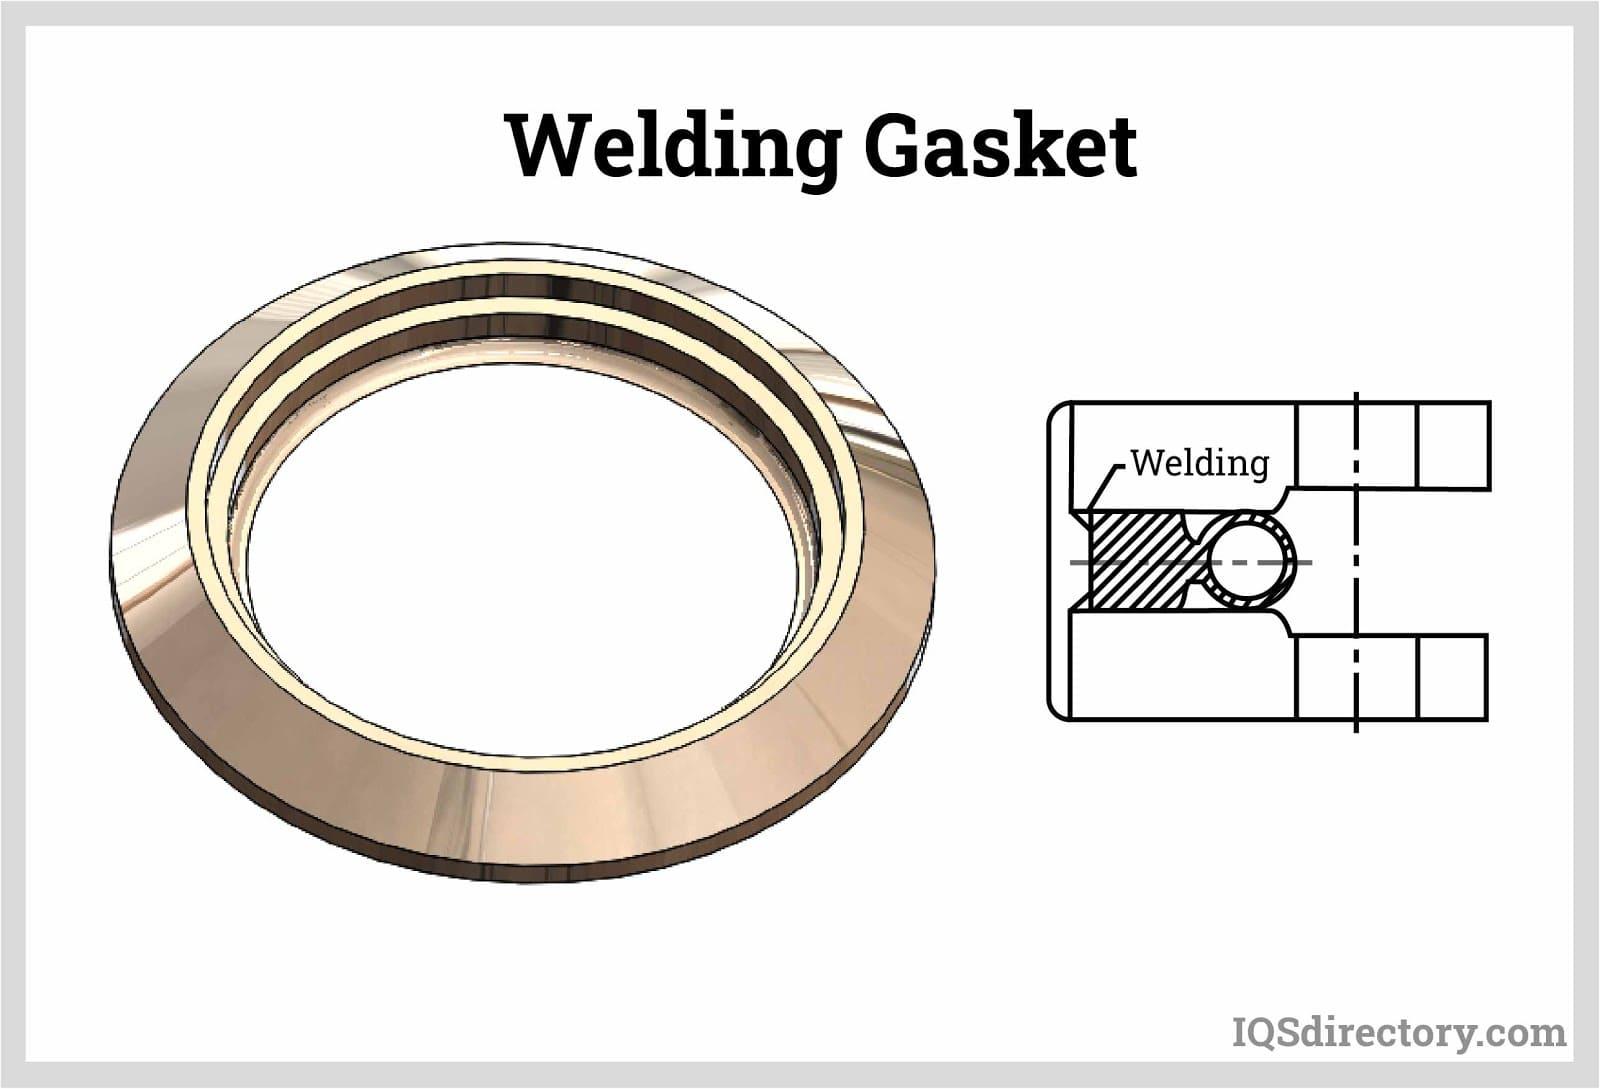 Welding Gasket